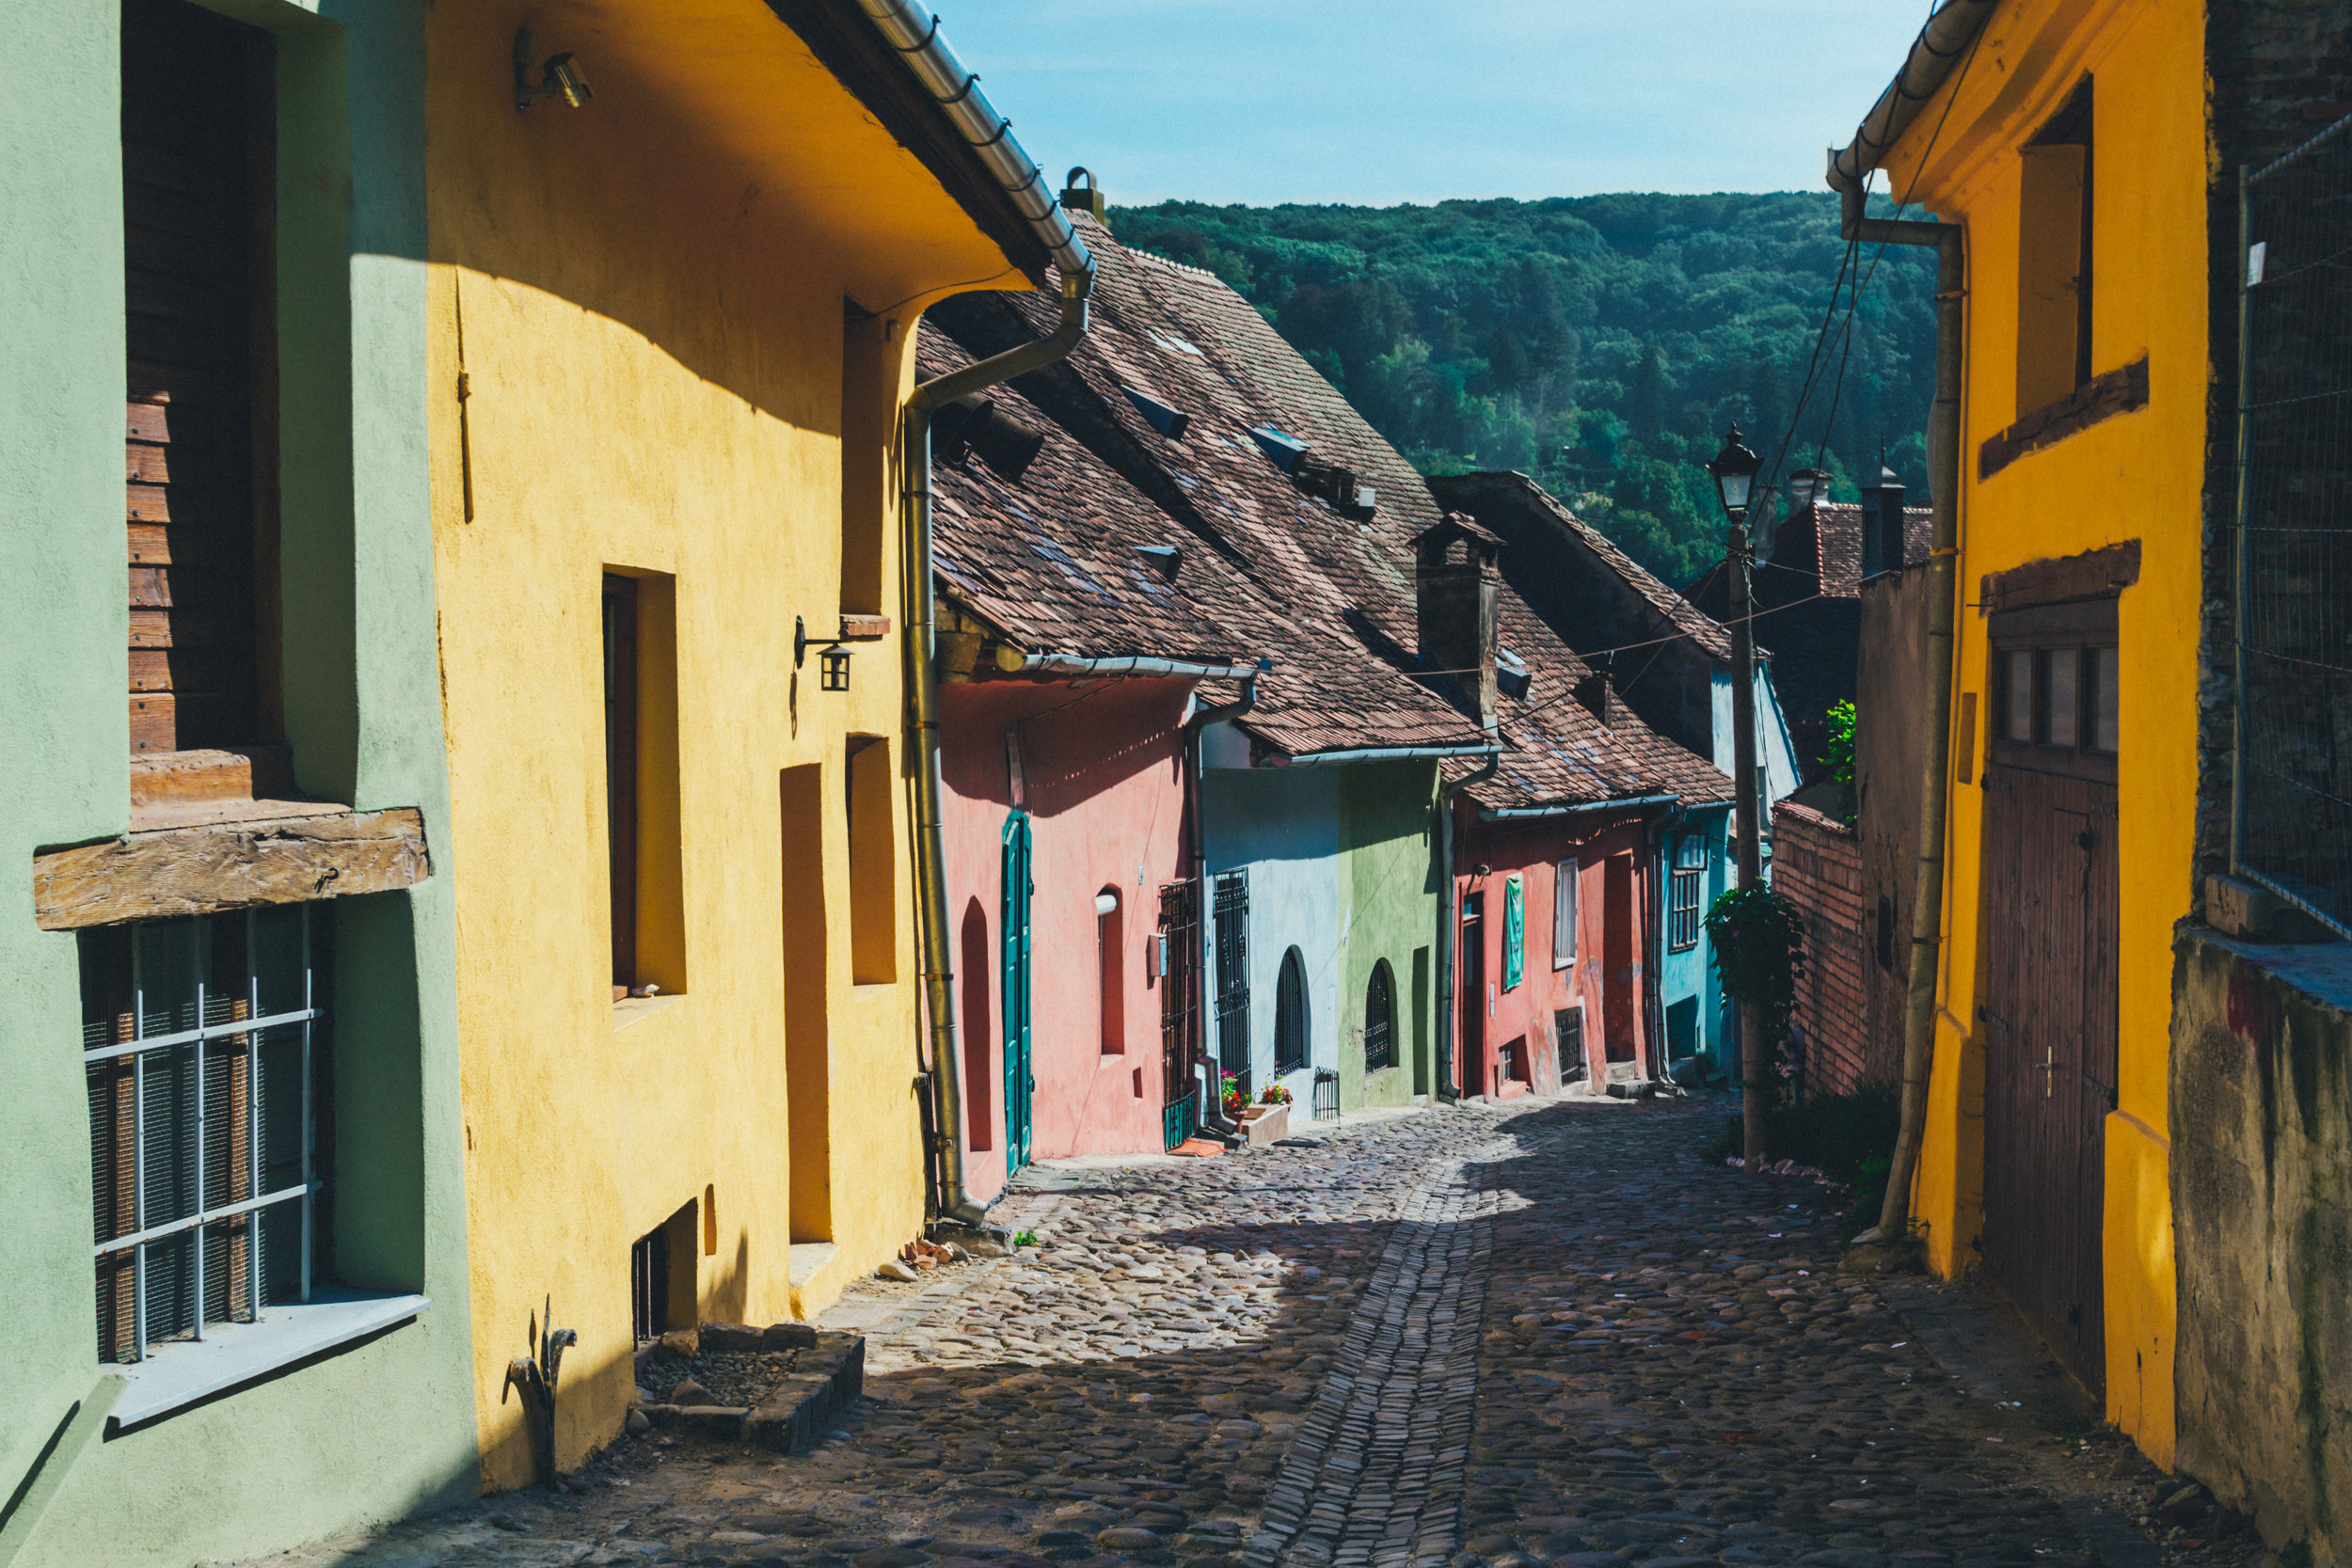 photo by:  freestocks.org